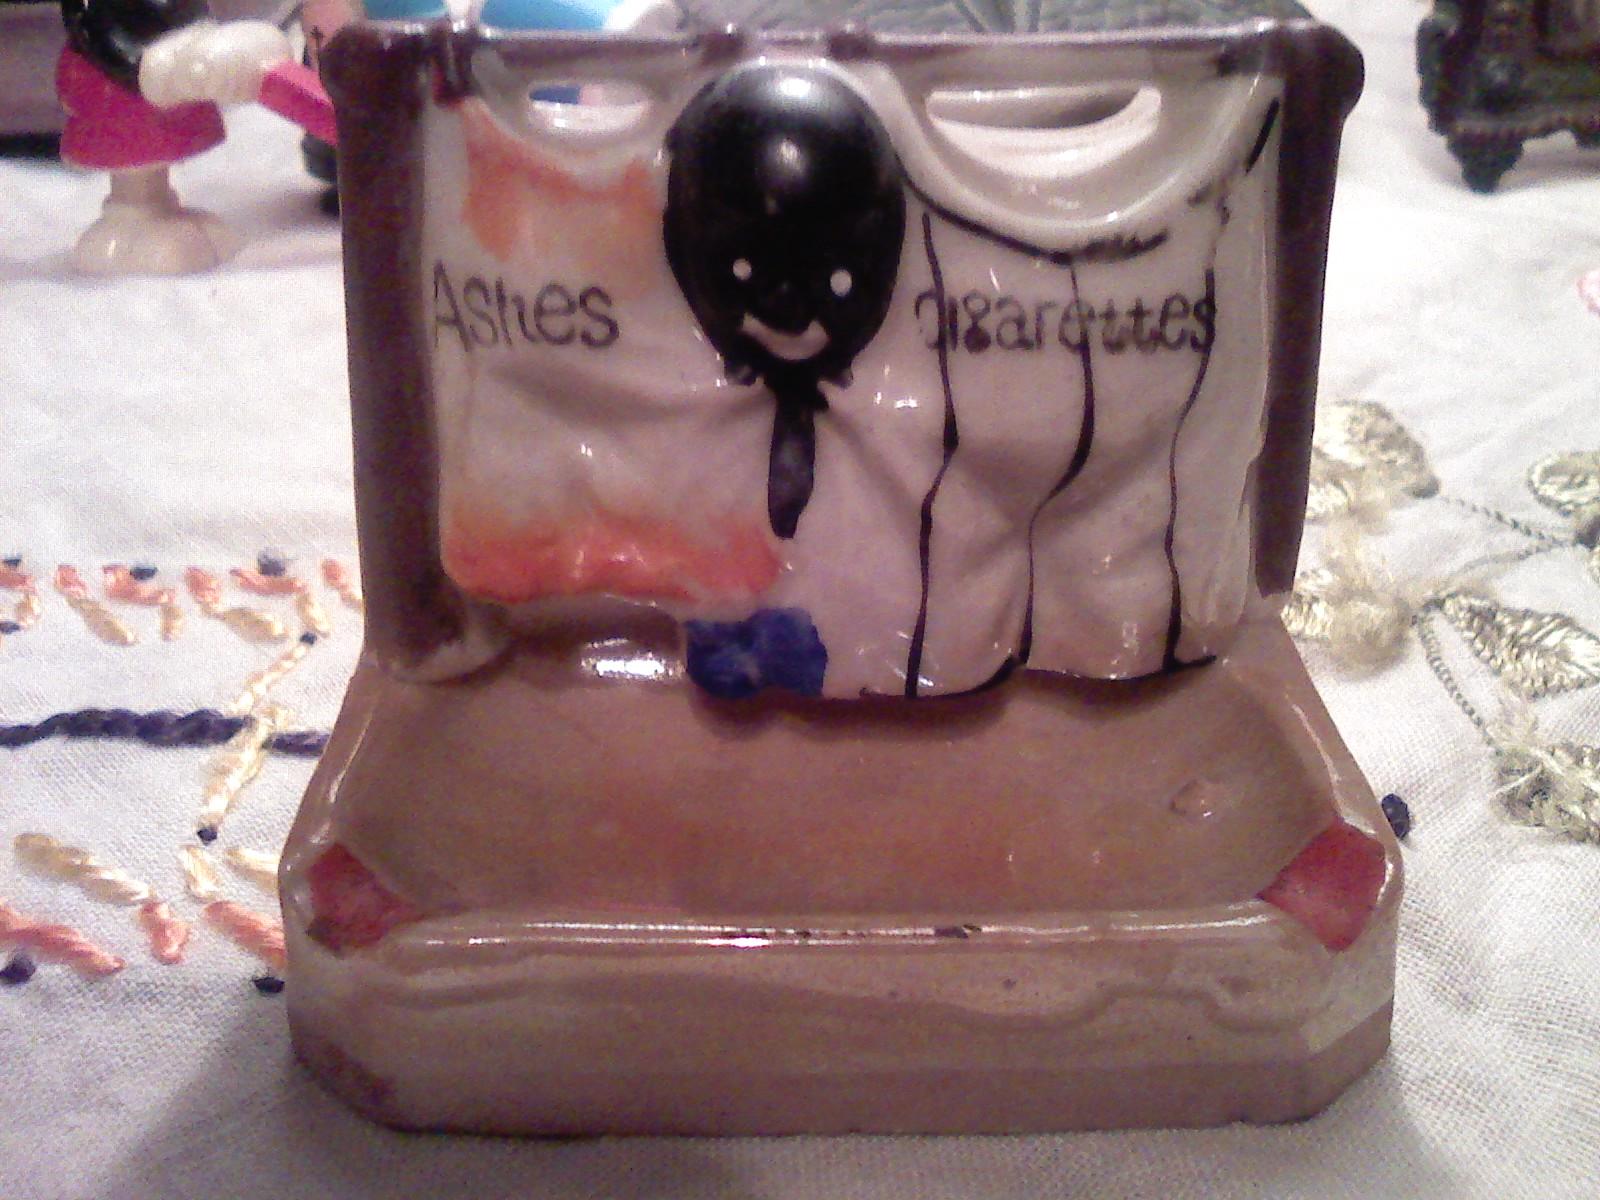 lusterware ashtray